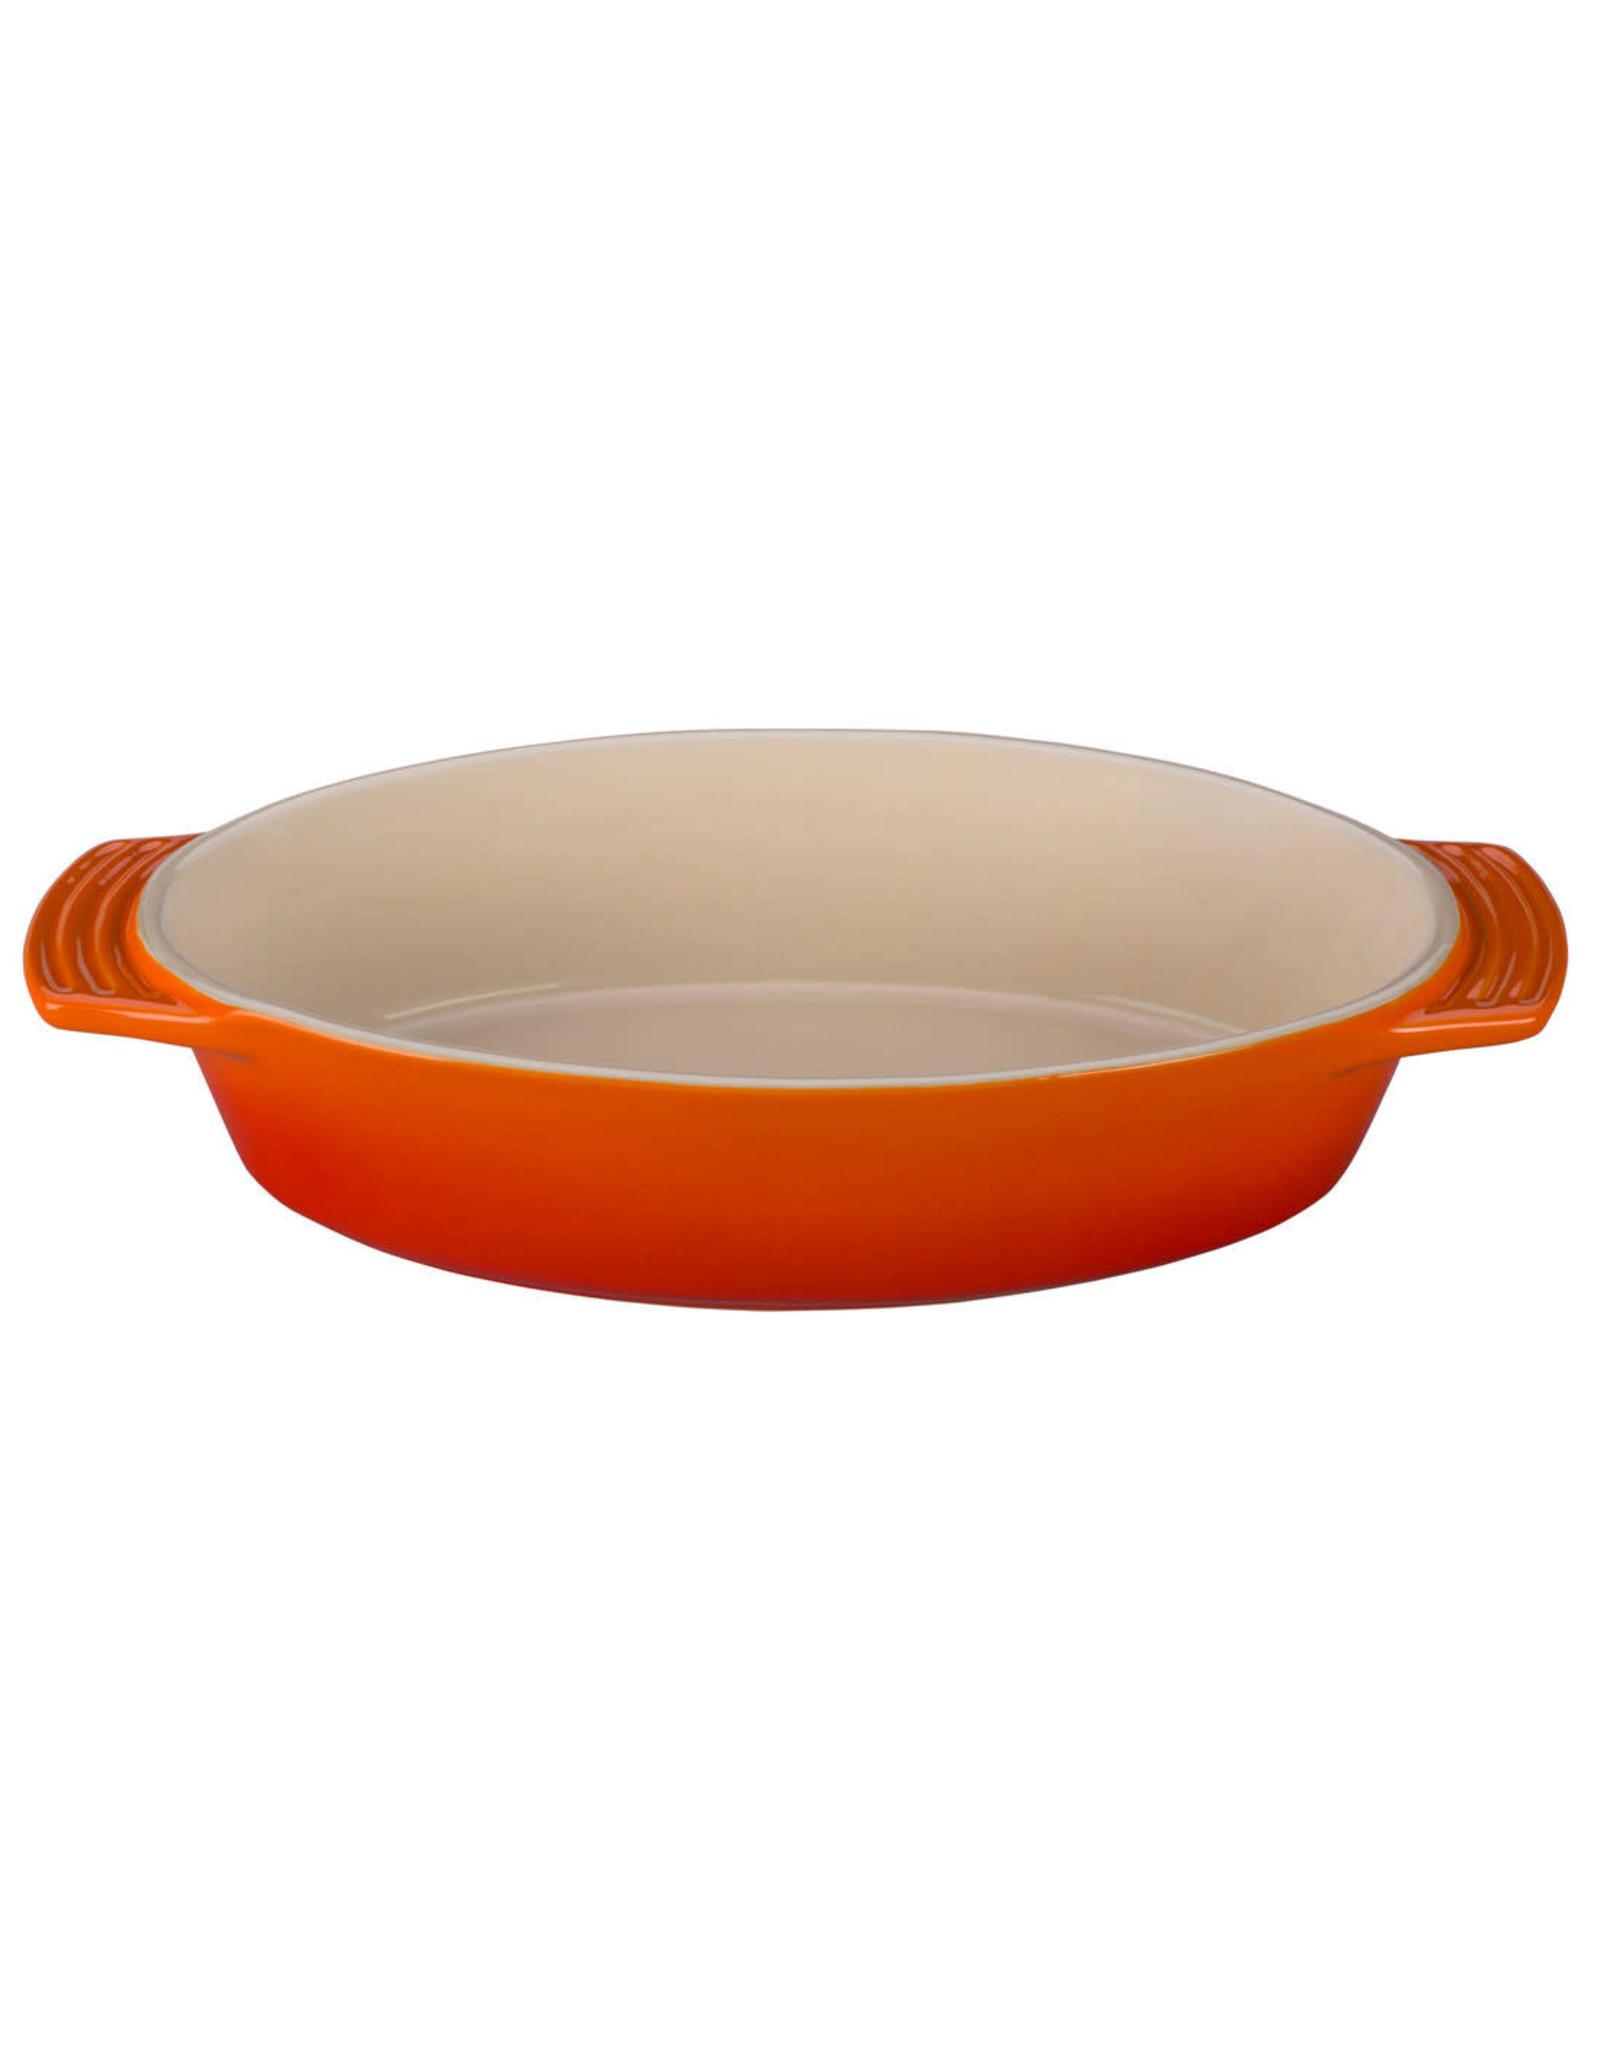 Le Creuset Le Creuset 3.5qt Oval Signature Dish Flame